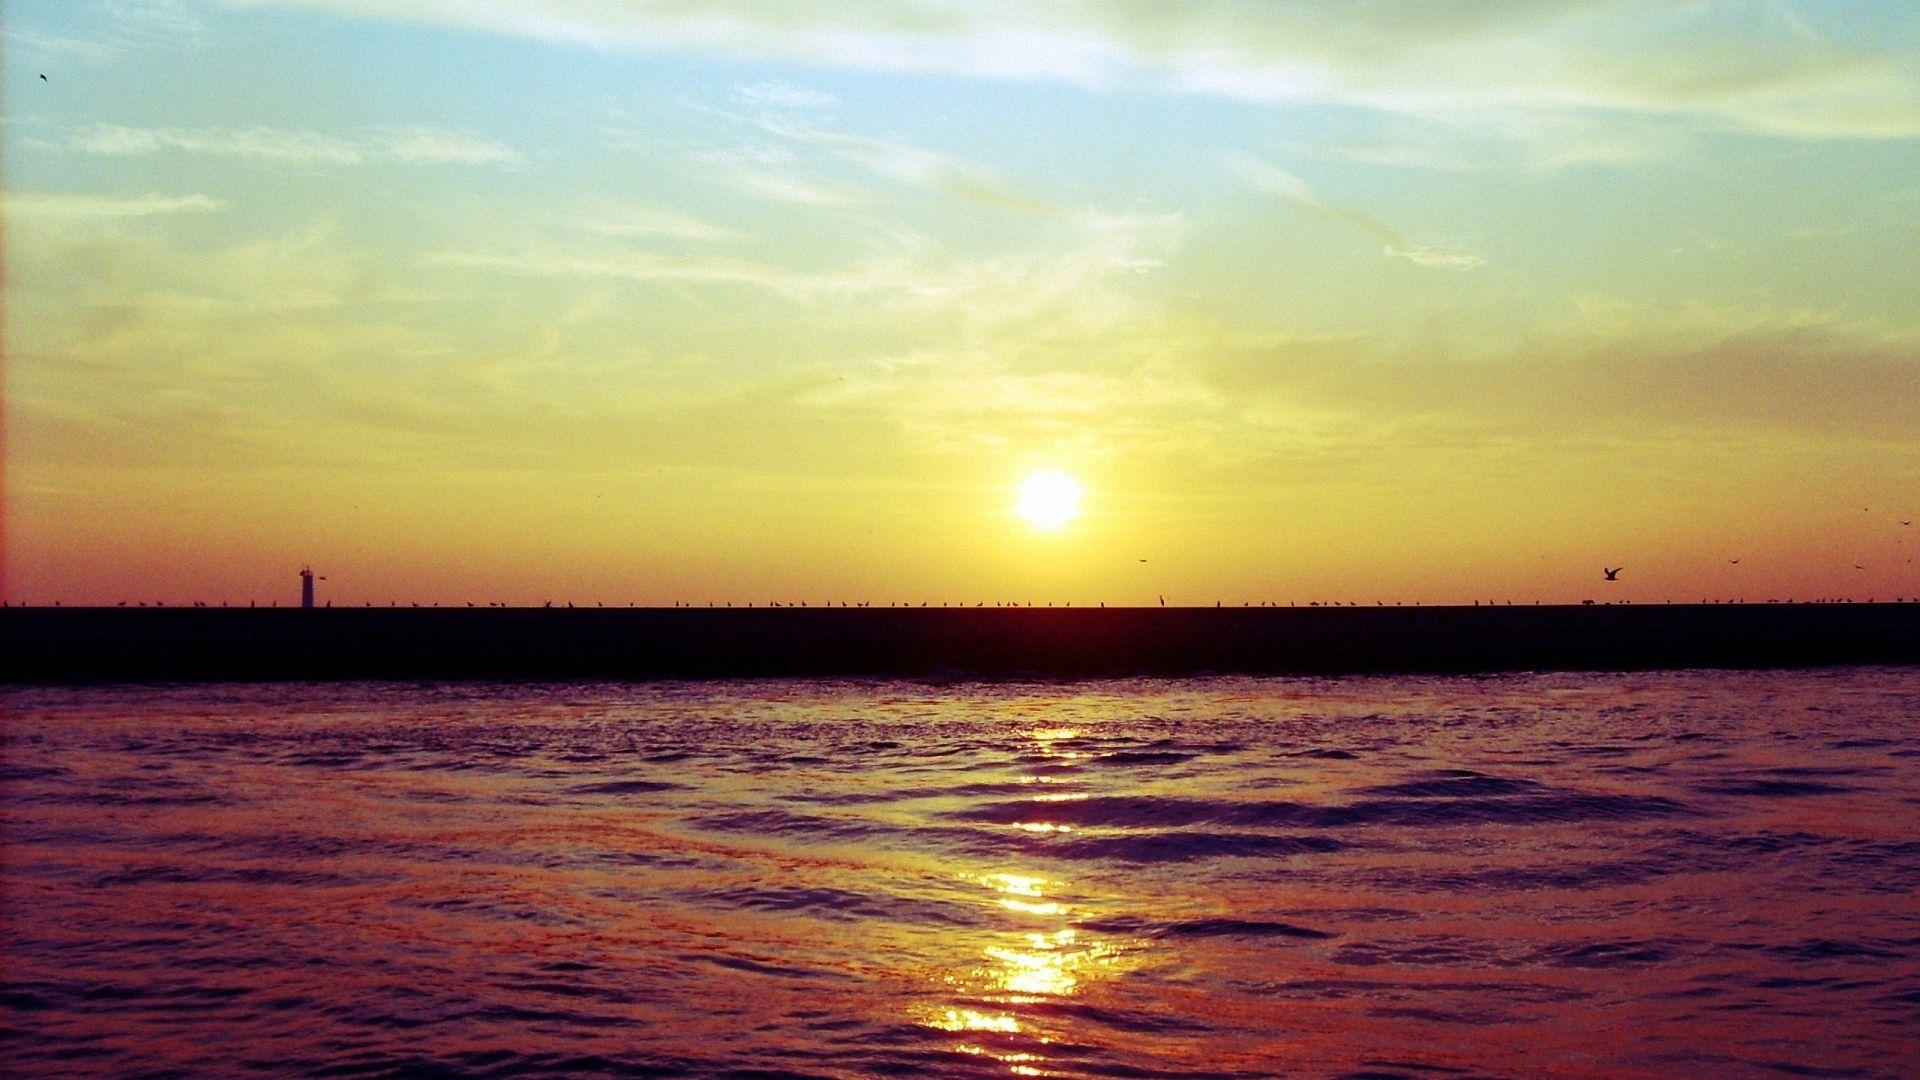 sunset, pier, sea - http://www.wallpapers4u.org/sunset-pier-sea/